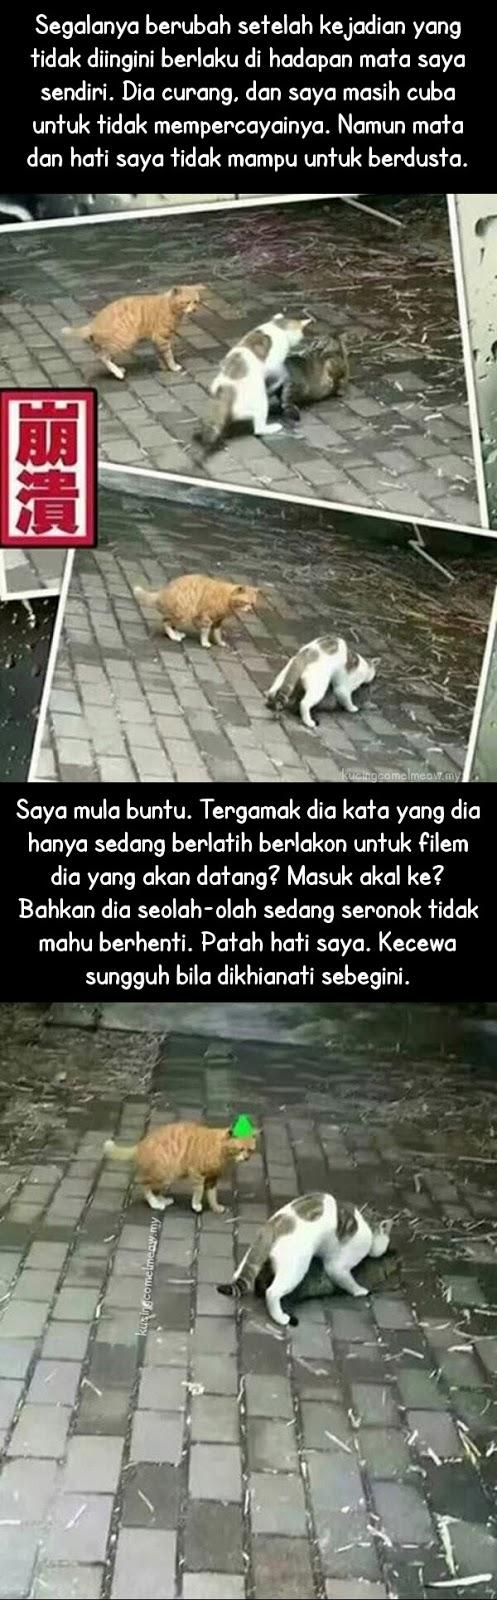 Kisah Kucing Patah Hat...